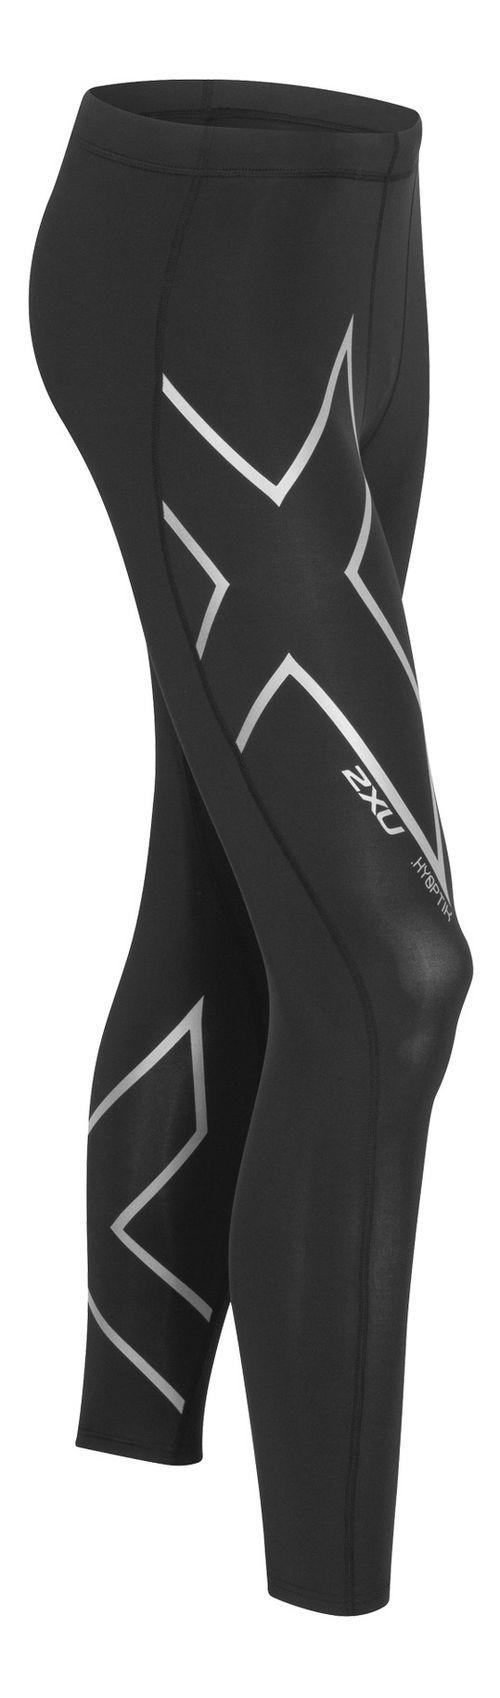 Mens 2XU Hyoptik Compression Tights & Leggings Pants - Black/Silver XXL